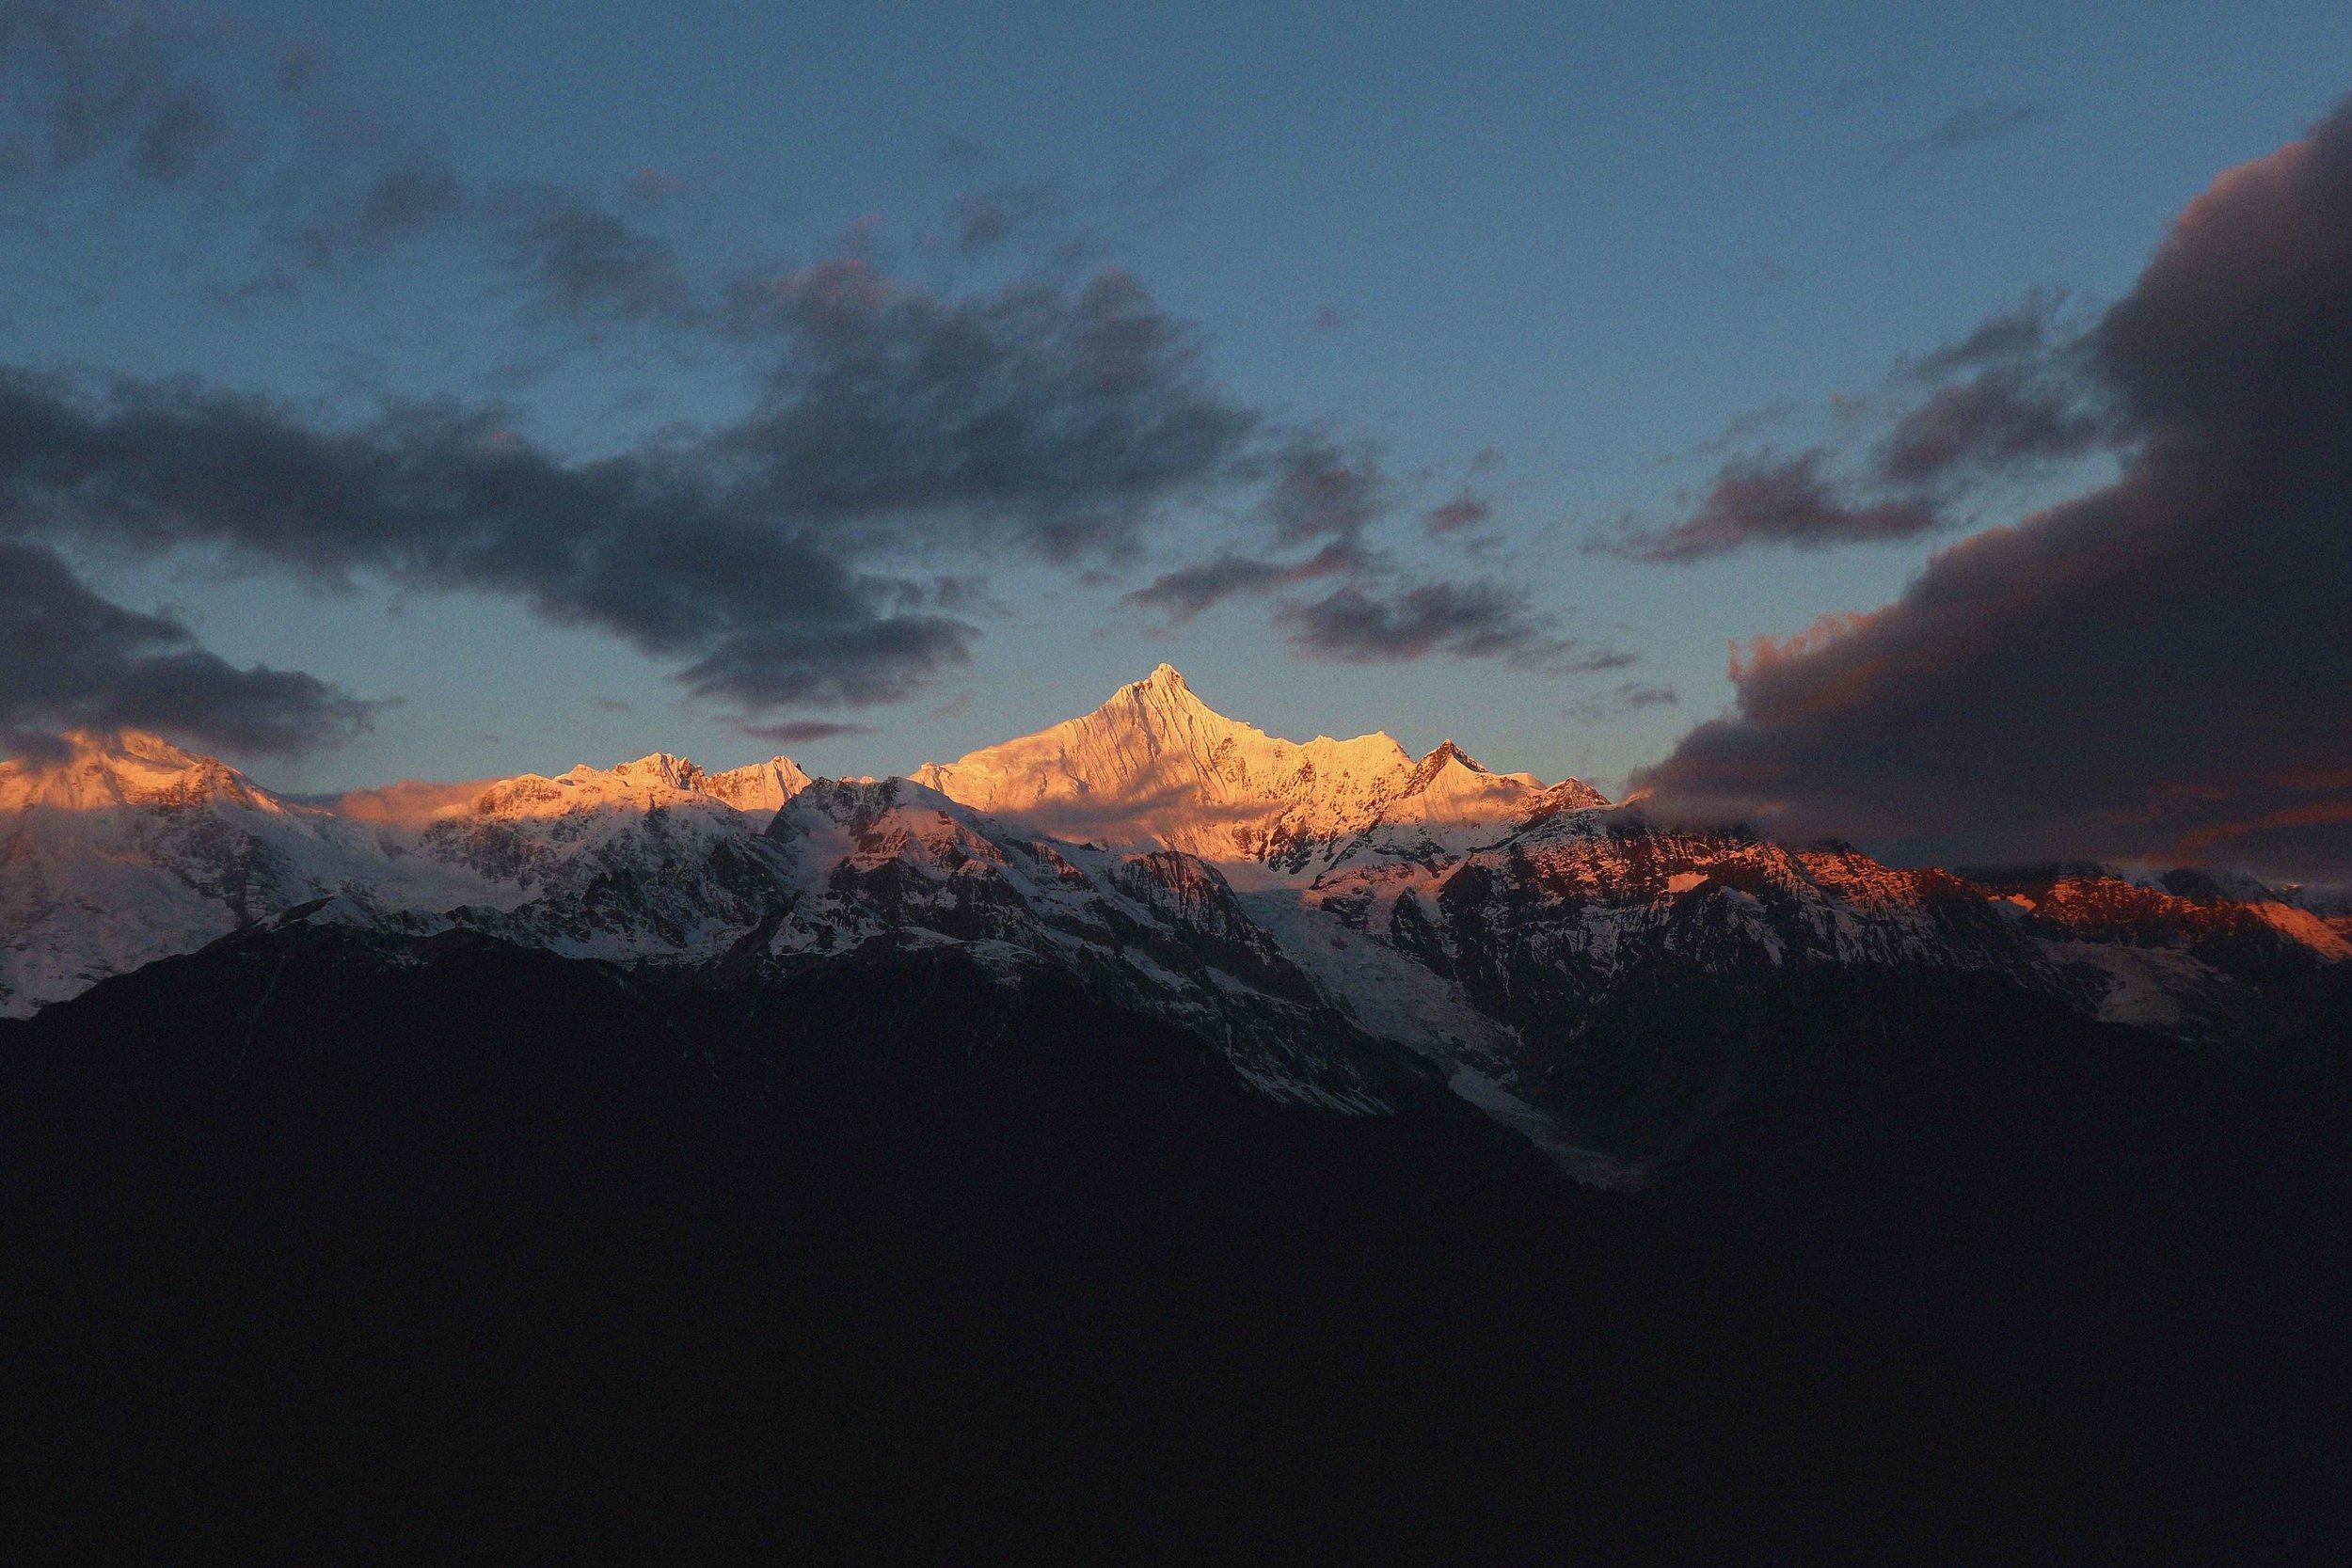 Sunrise on the Meili Mountain range from Feilai Si